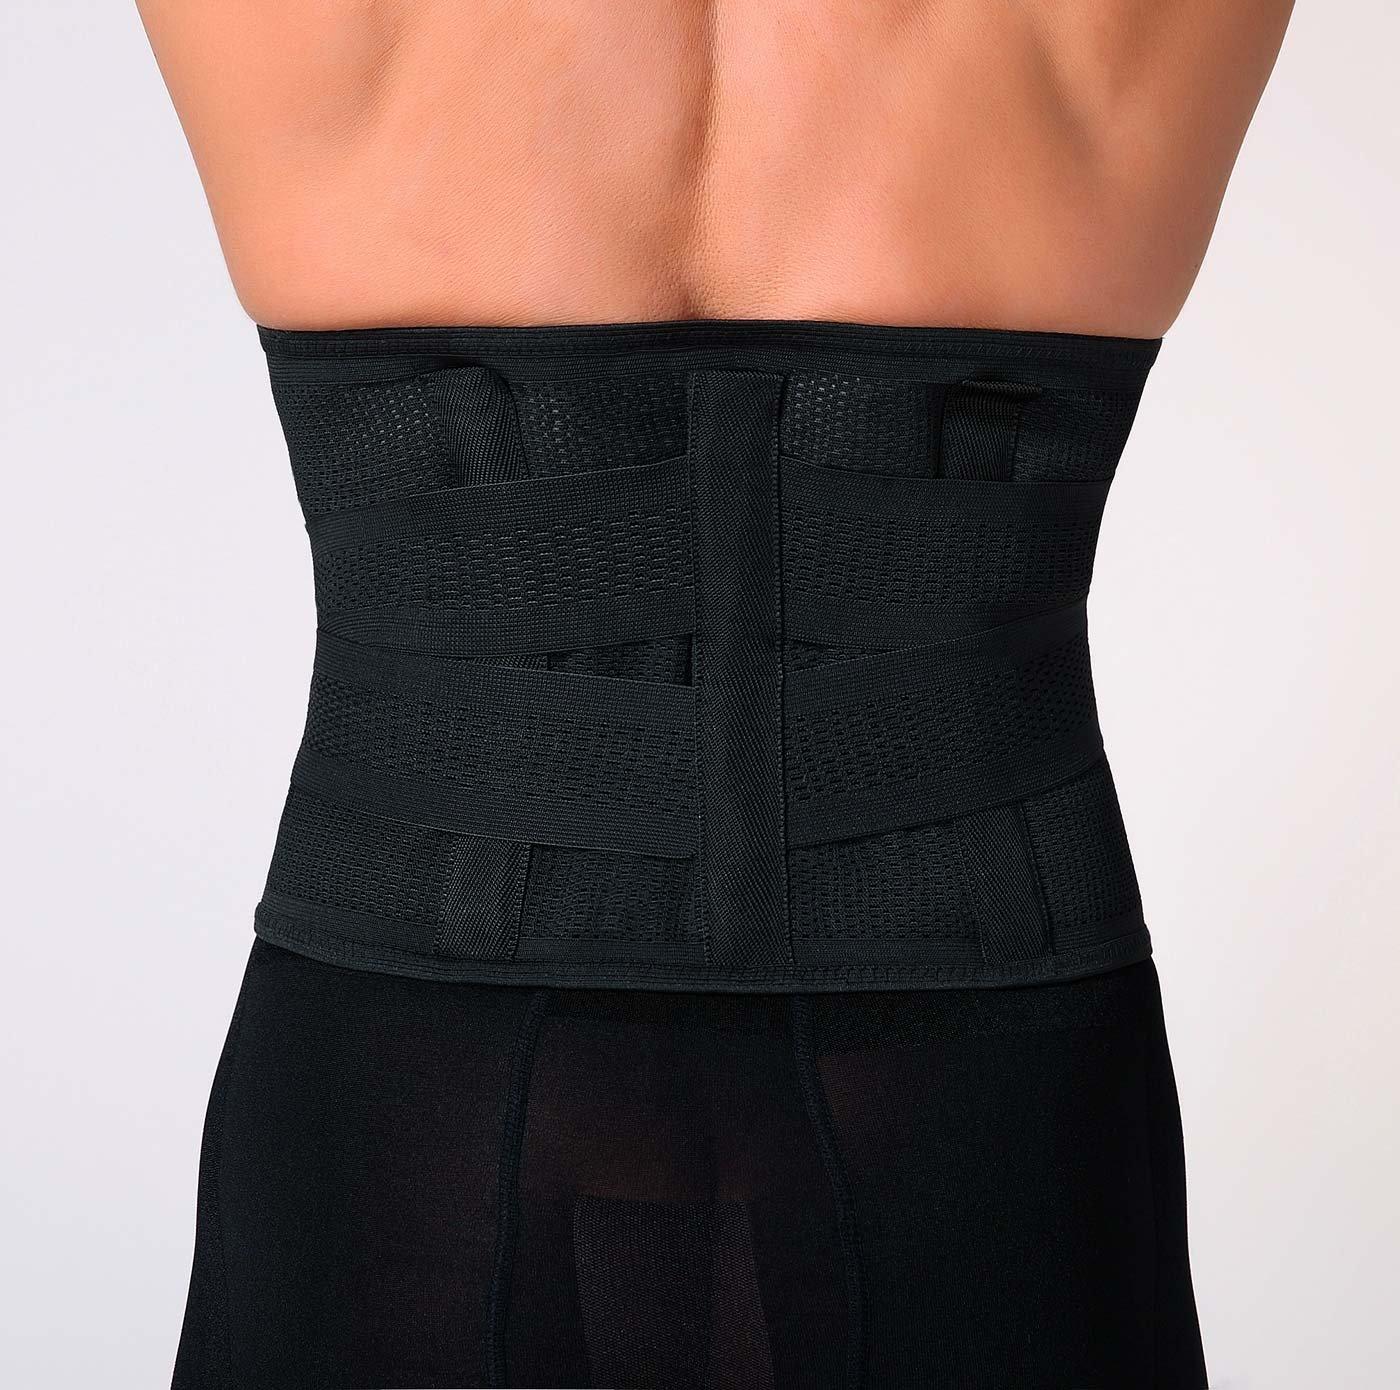 b9317ccf69361 Amazon.com  Panegy Men s Waist Lumbar Trainer Girdle Beer Belly Trimmer  Adjustable Shapewear  Clothing